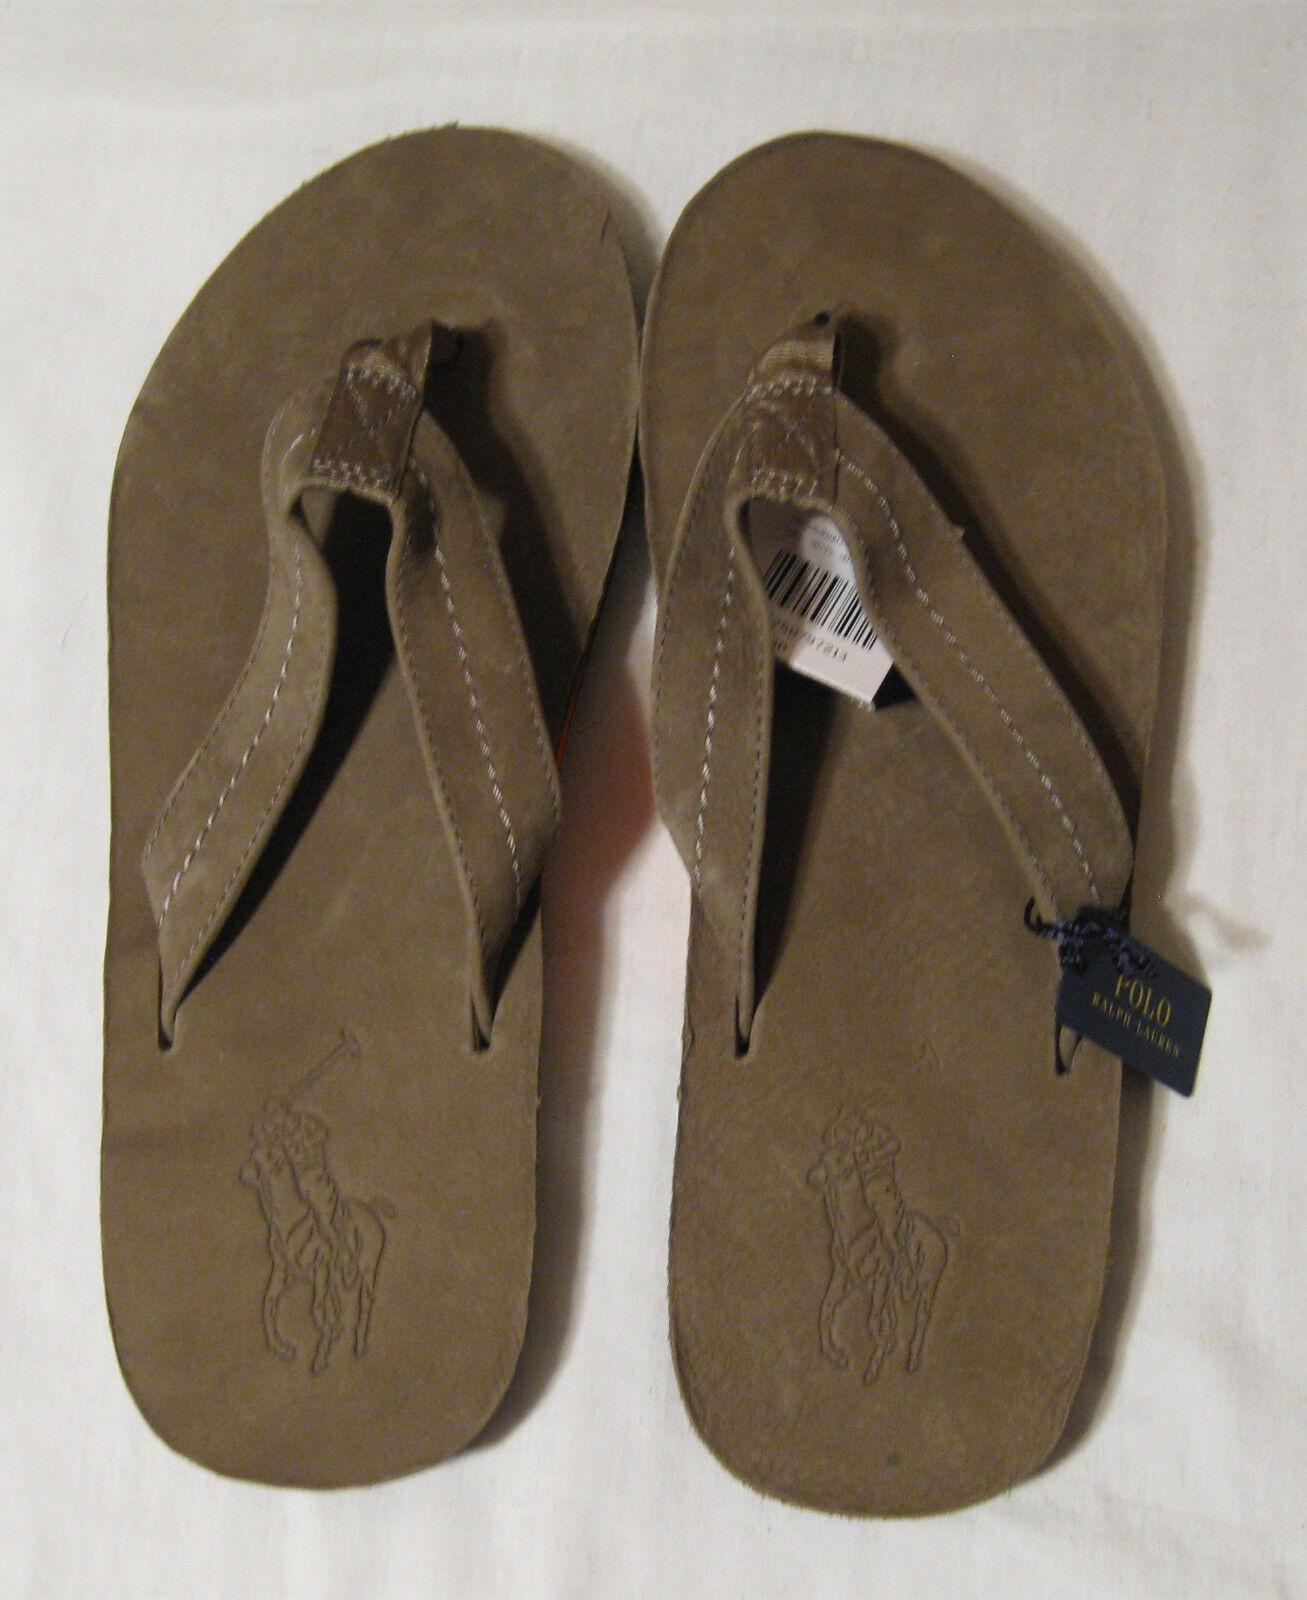 Polo Ralph Lauren Men's Leather Suede Big Pony Sandals Flip Flops NWT Olive